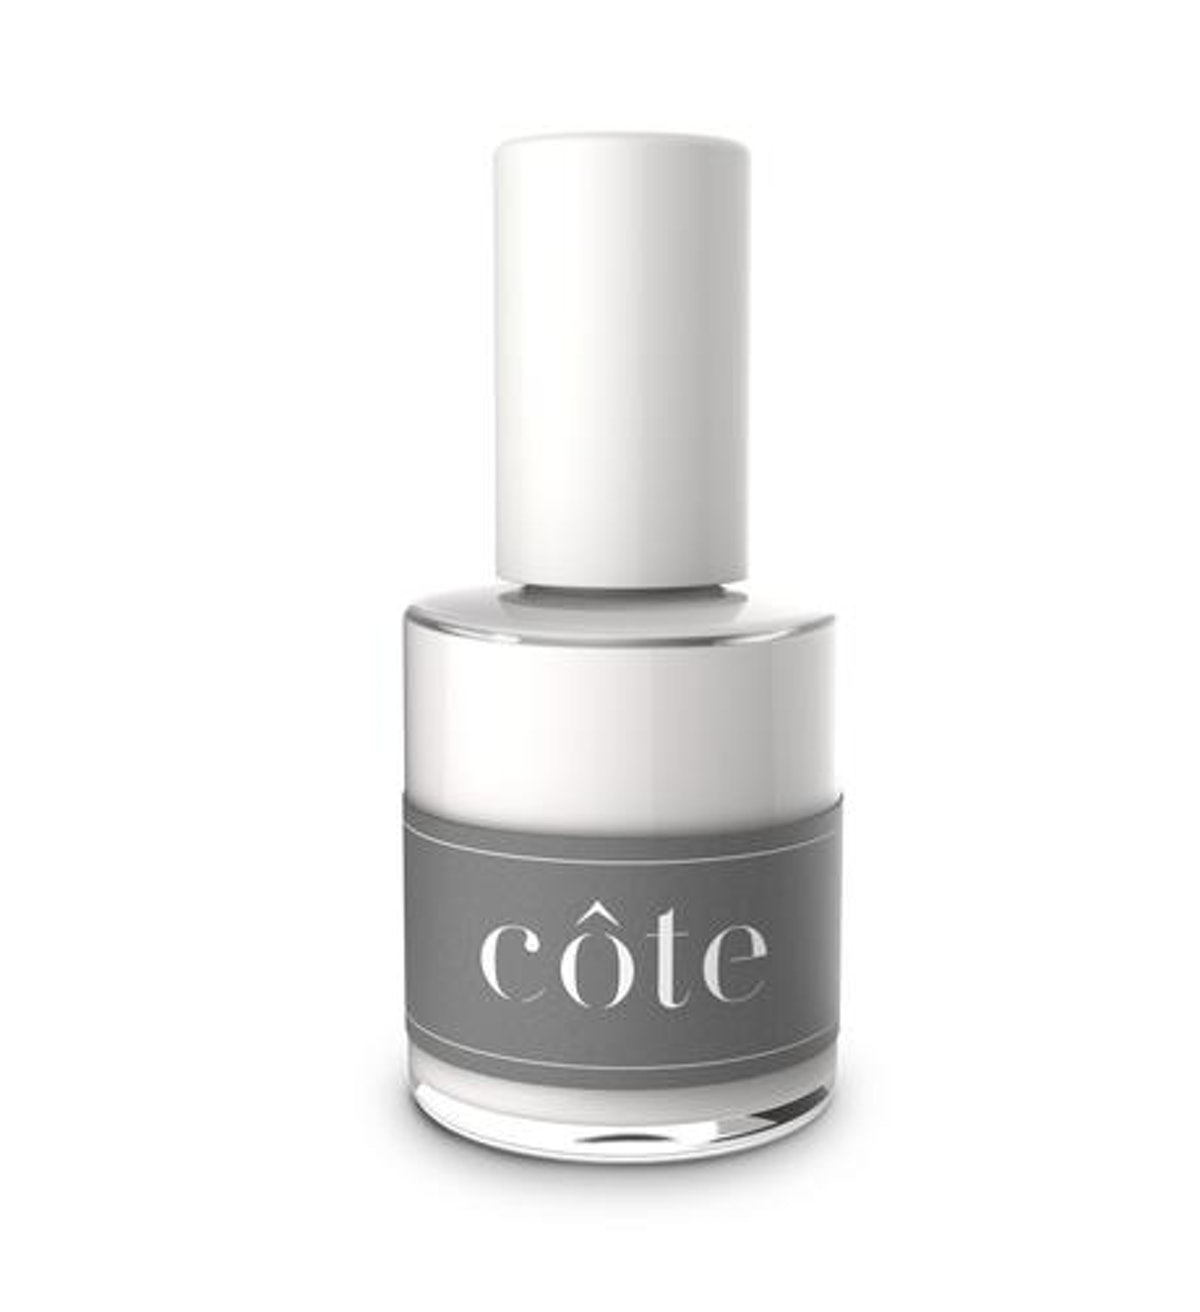 No. 2 Pure White Nail Polish